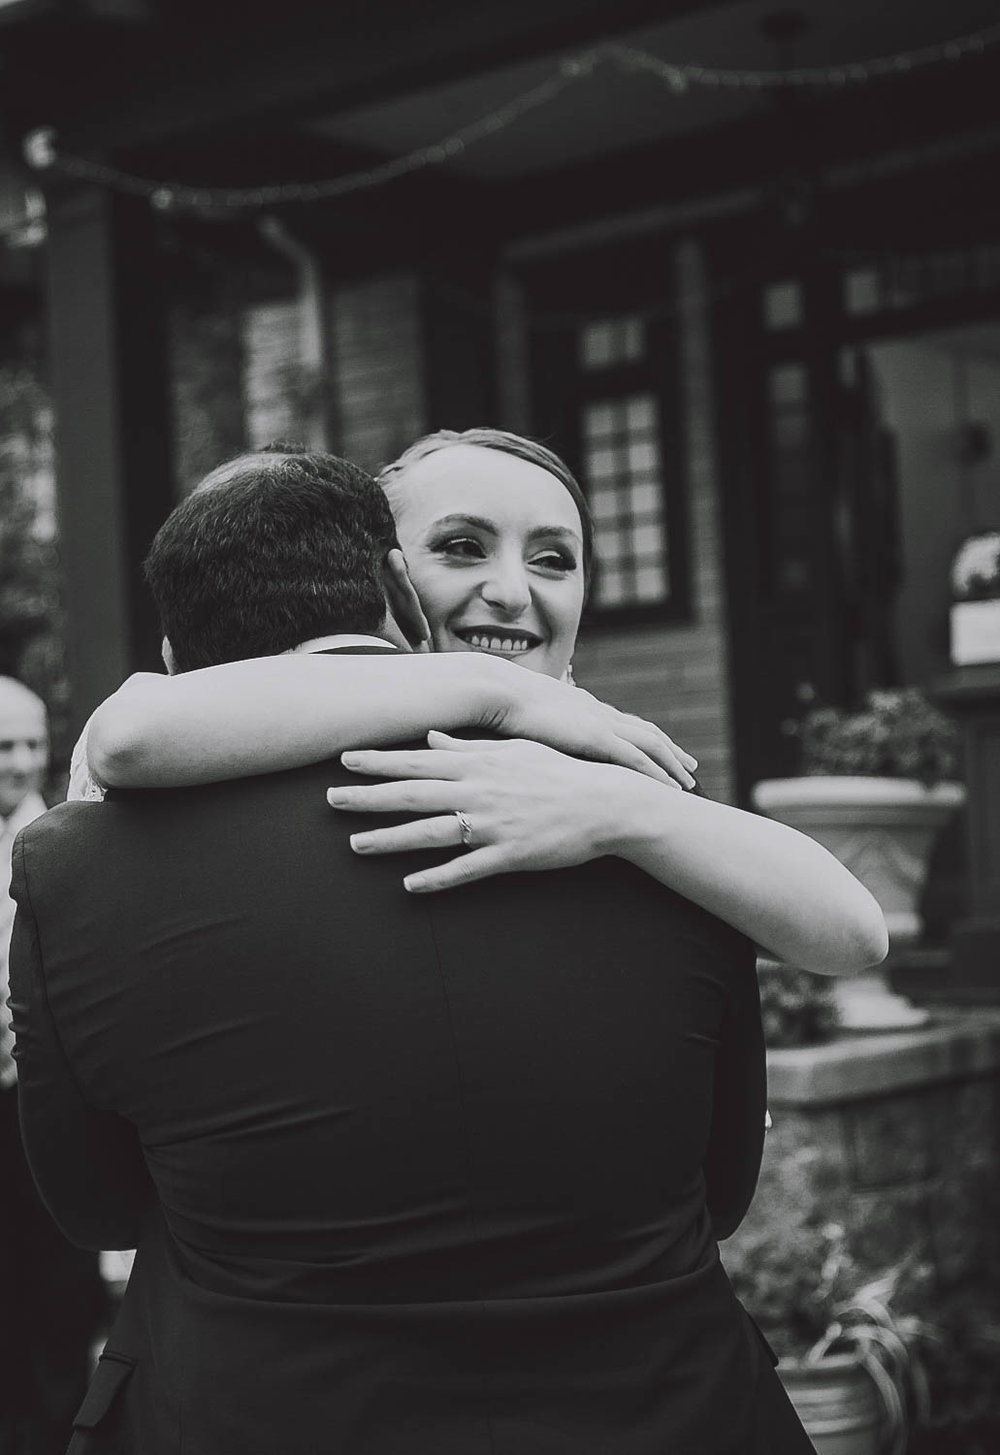 ecaterina-chandu-dondeti-wedding-photography21.jpg